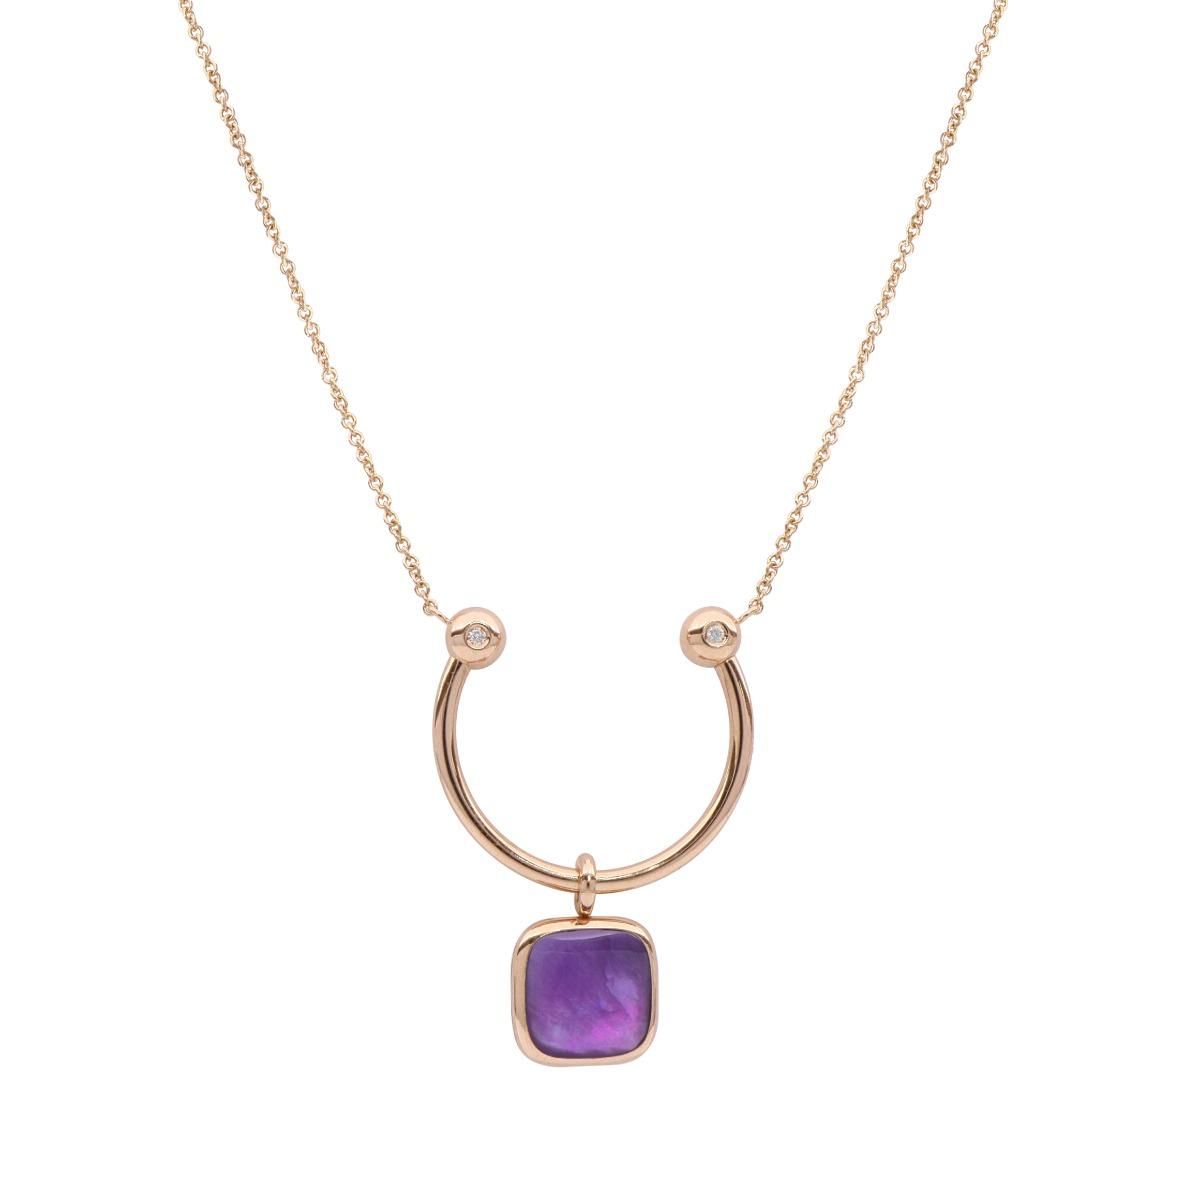 Reversible Square Purple Gemstone Necklace